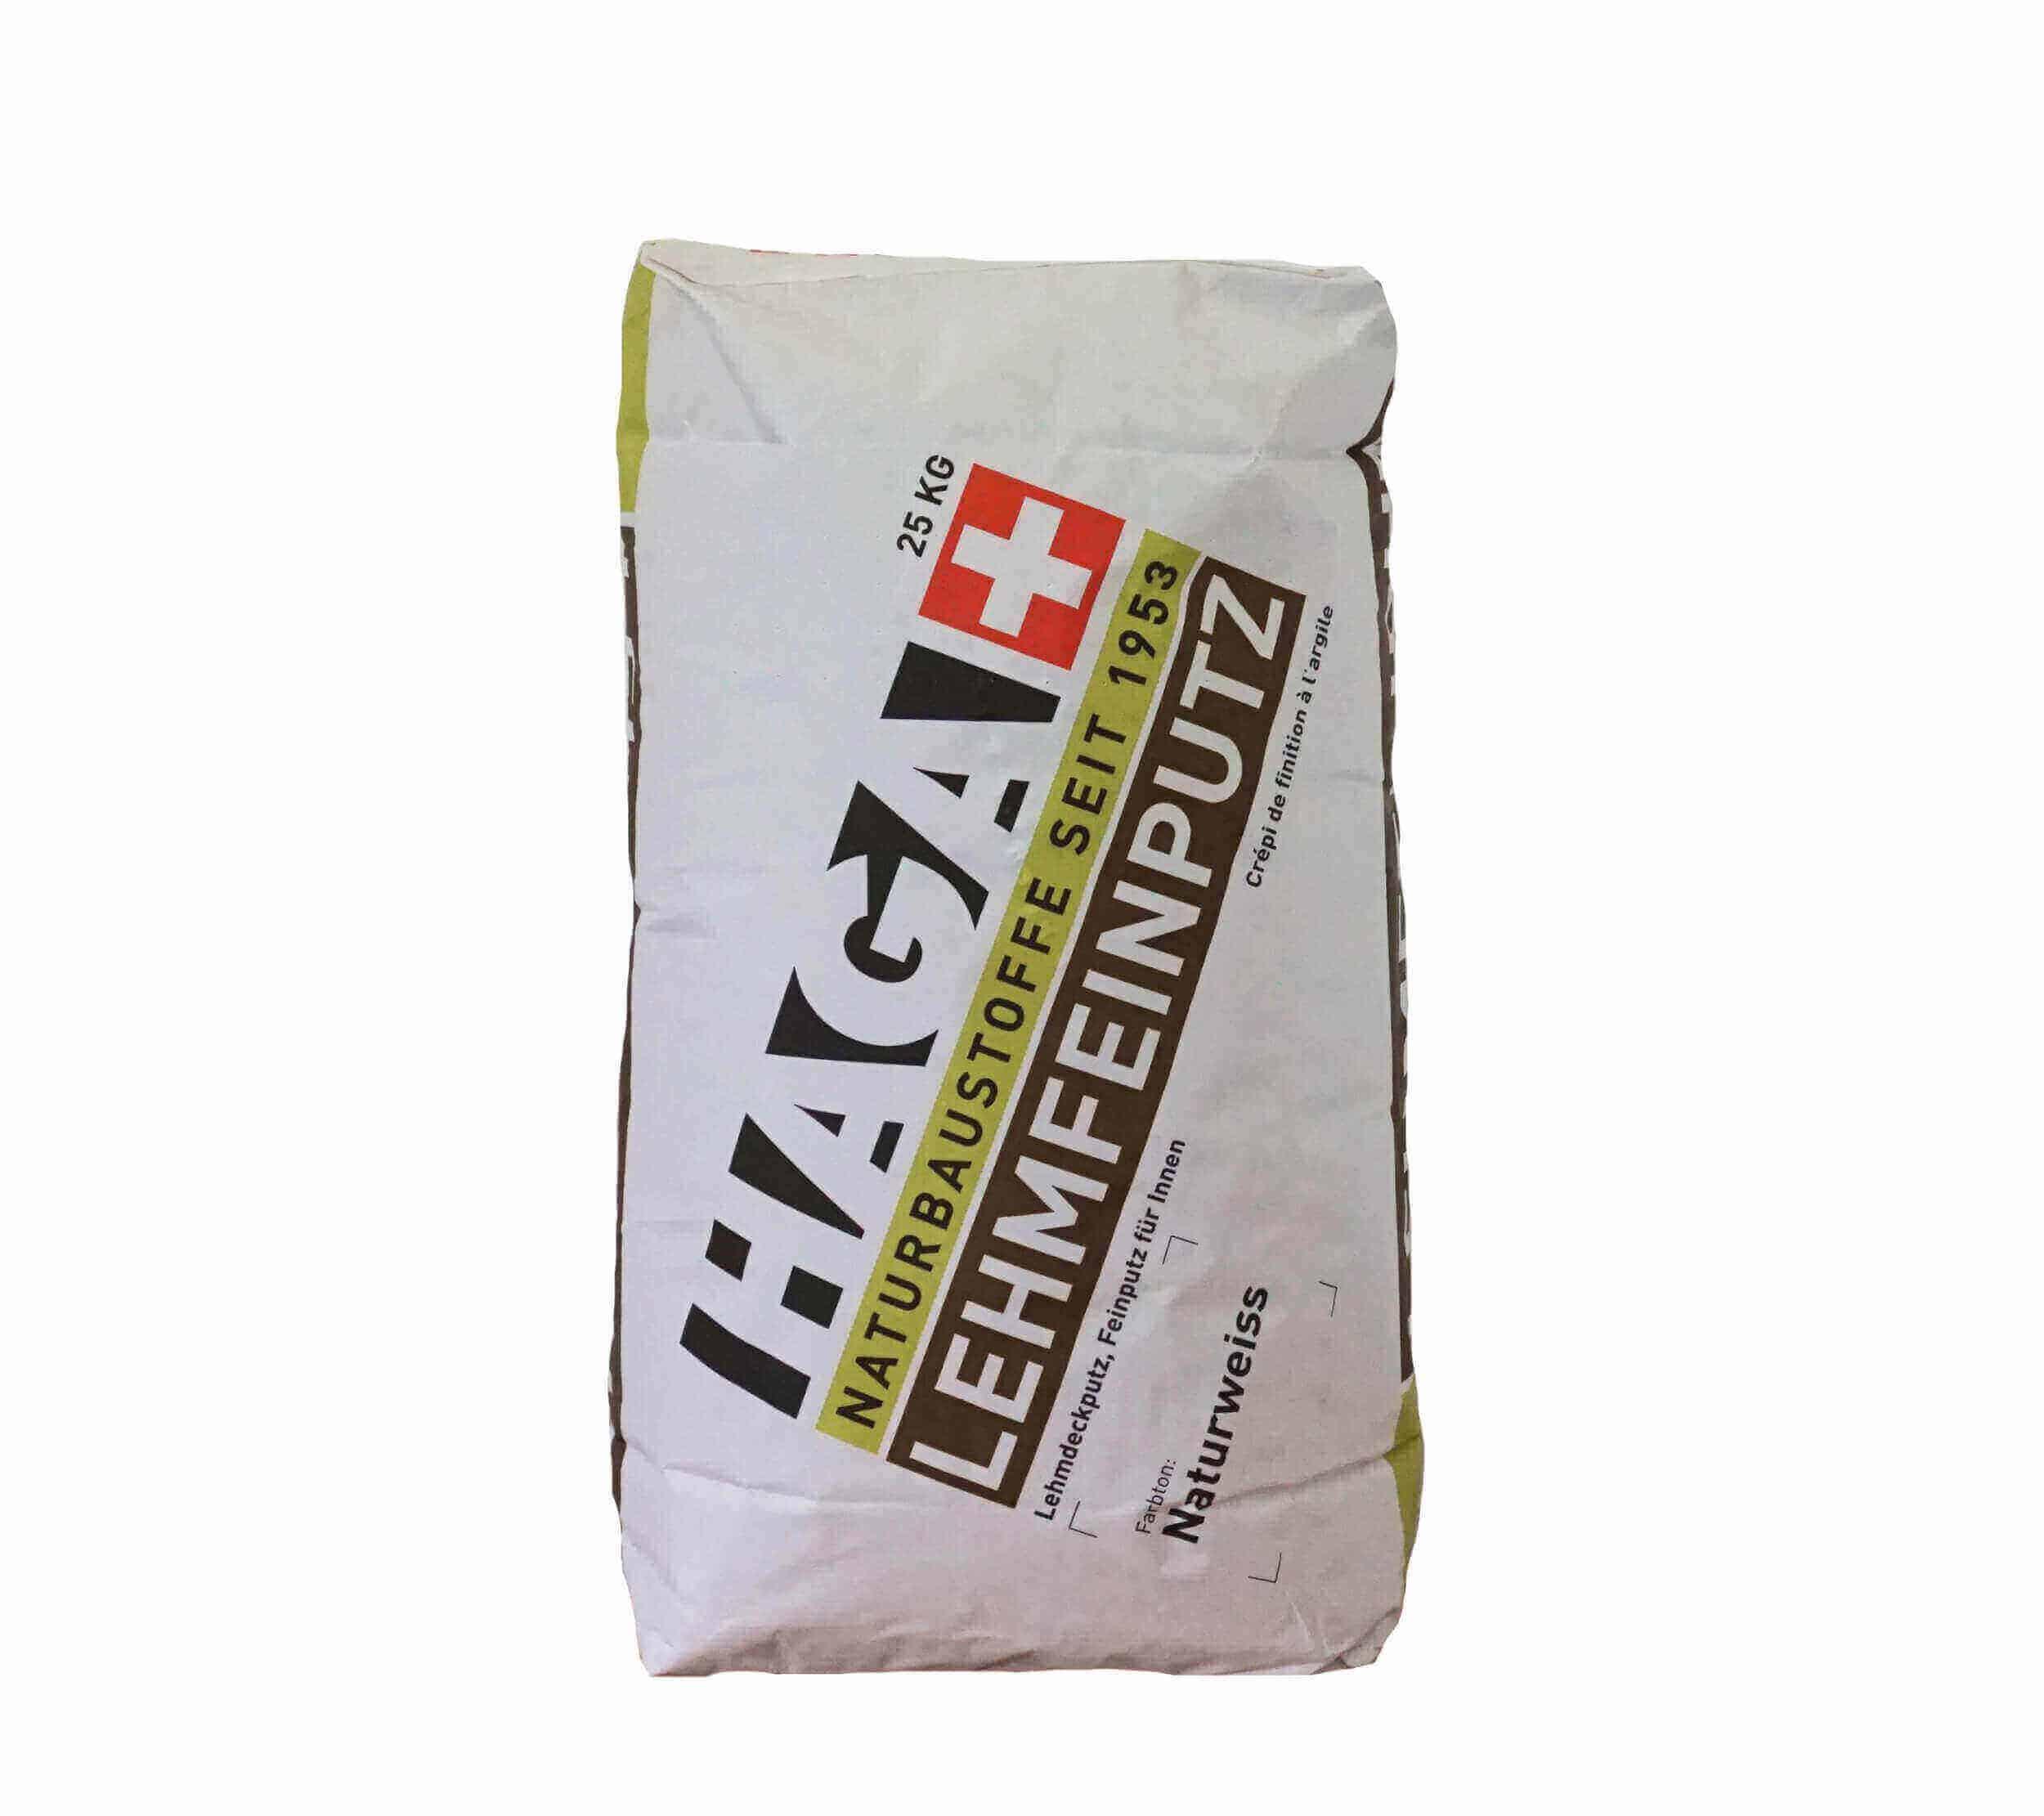 haga ag, rupperswil | lehm feinputz premium h523.0 i 25kg | haga ag